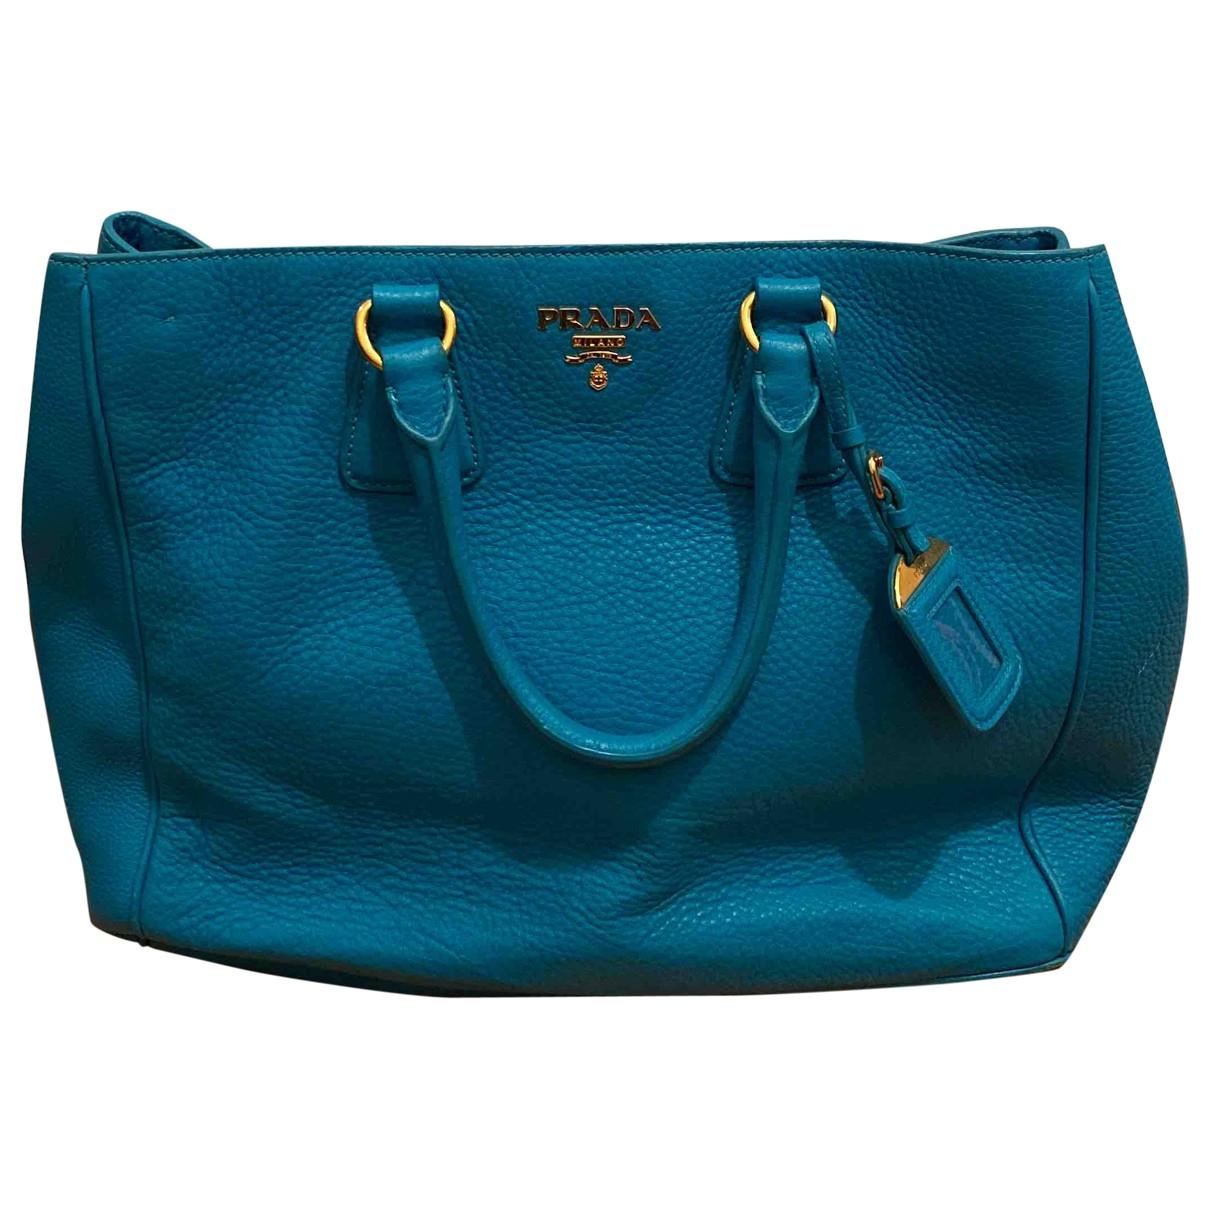 Prada \N Turquoise Leather handbag for Women \N